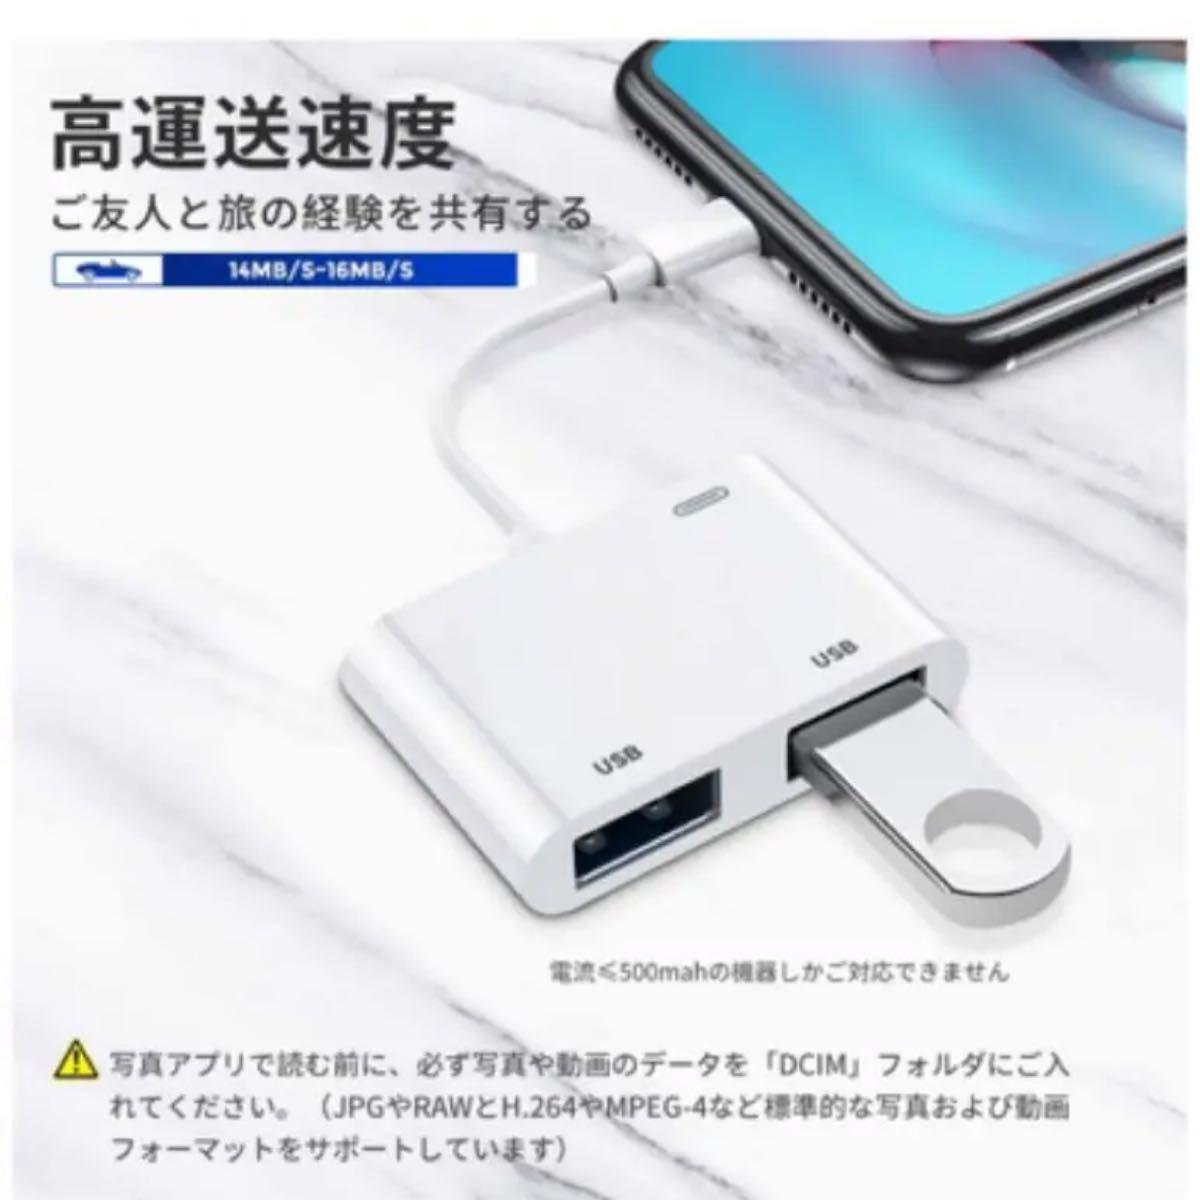 Lightning USB カメラ アダプタ iPhone/iPad専用 3in1ライトニング USBカメラ 変換アダプター